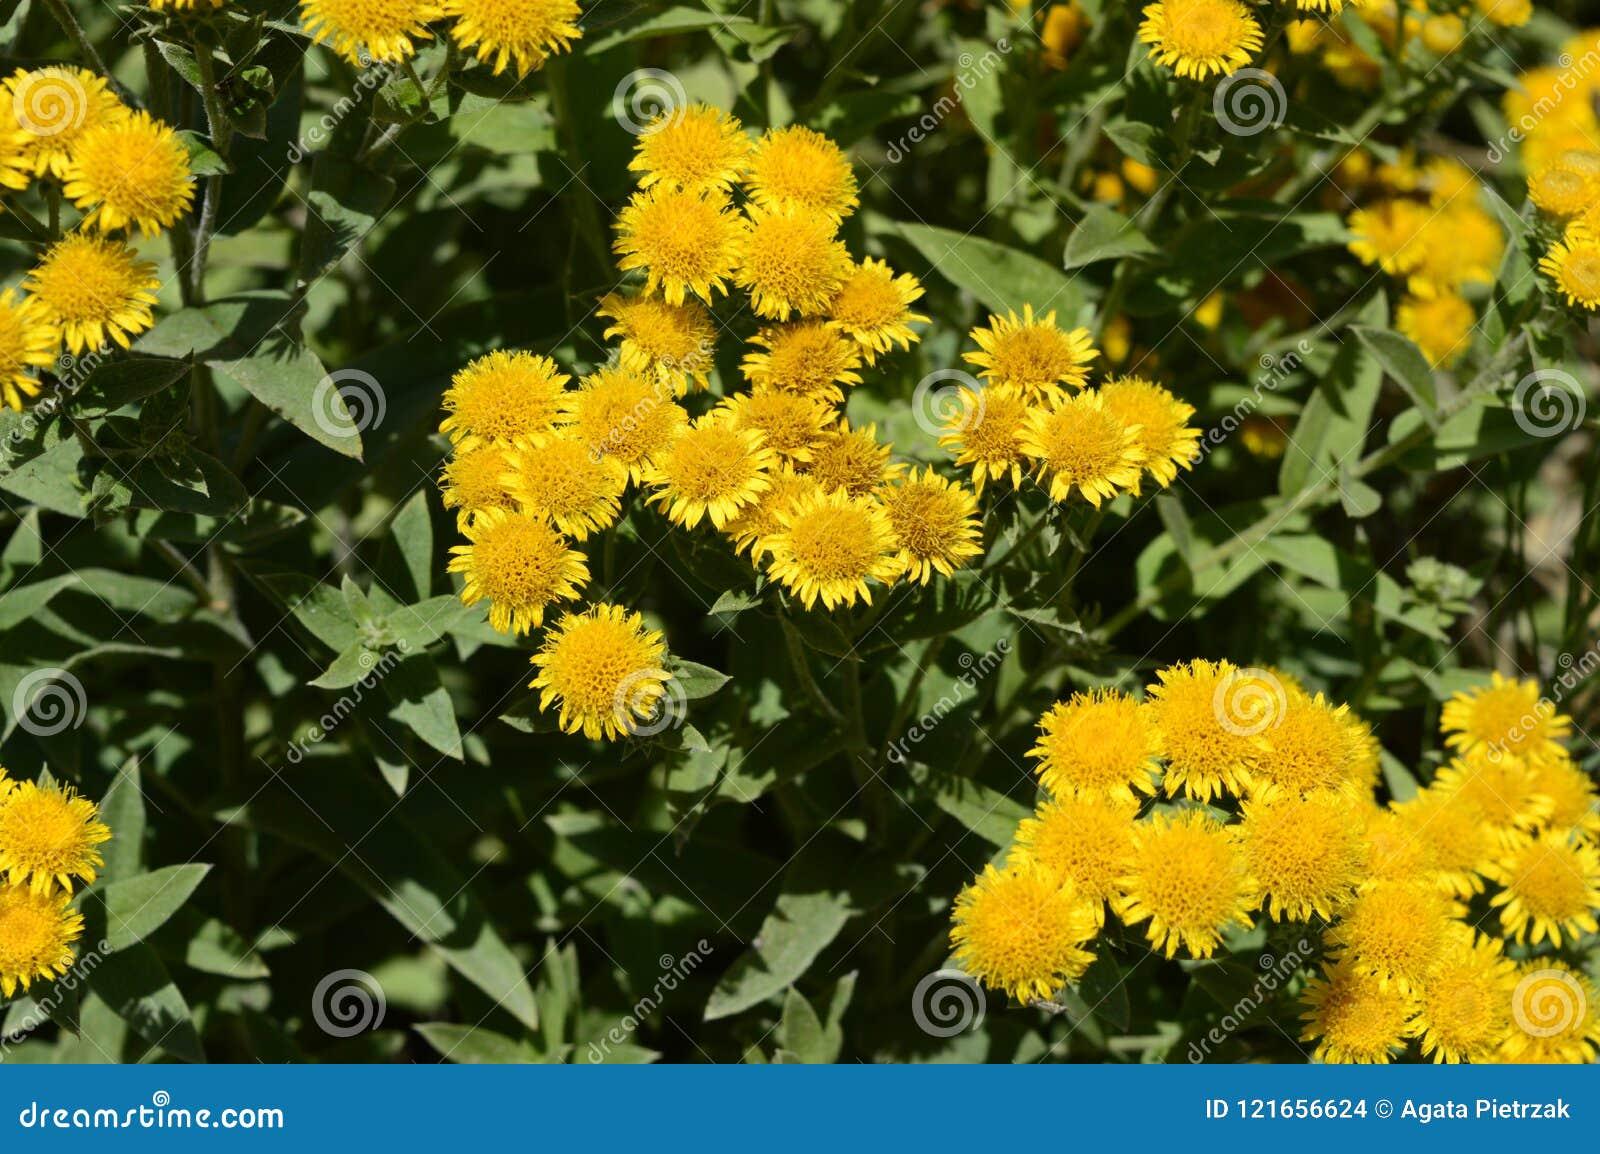 Inula Germanica Yellow Daisy Like Flowers Stock Photo Image Of